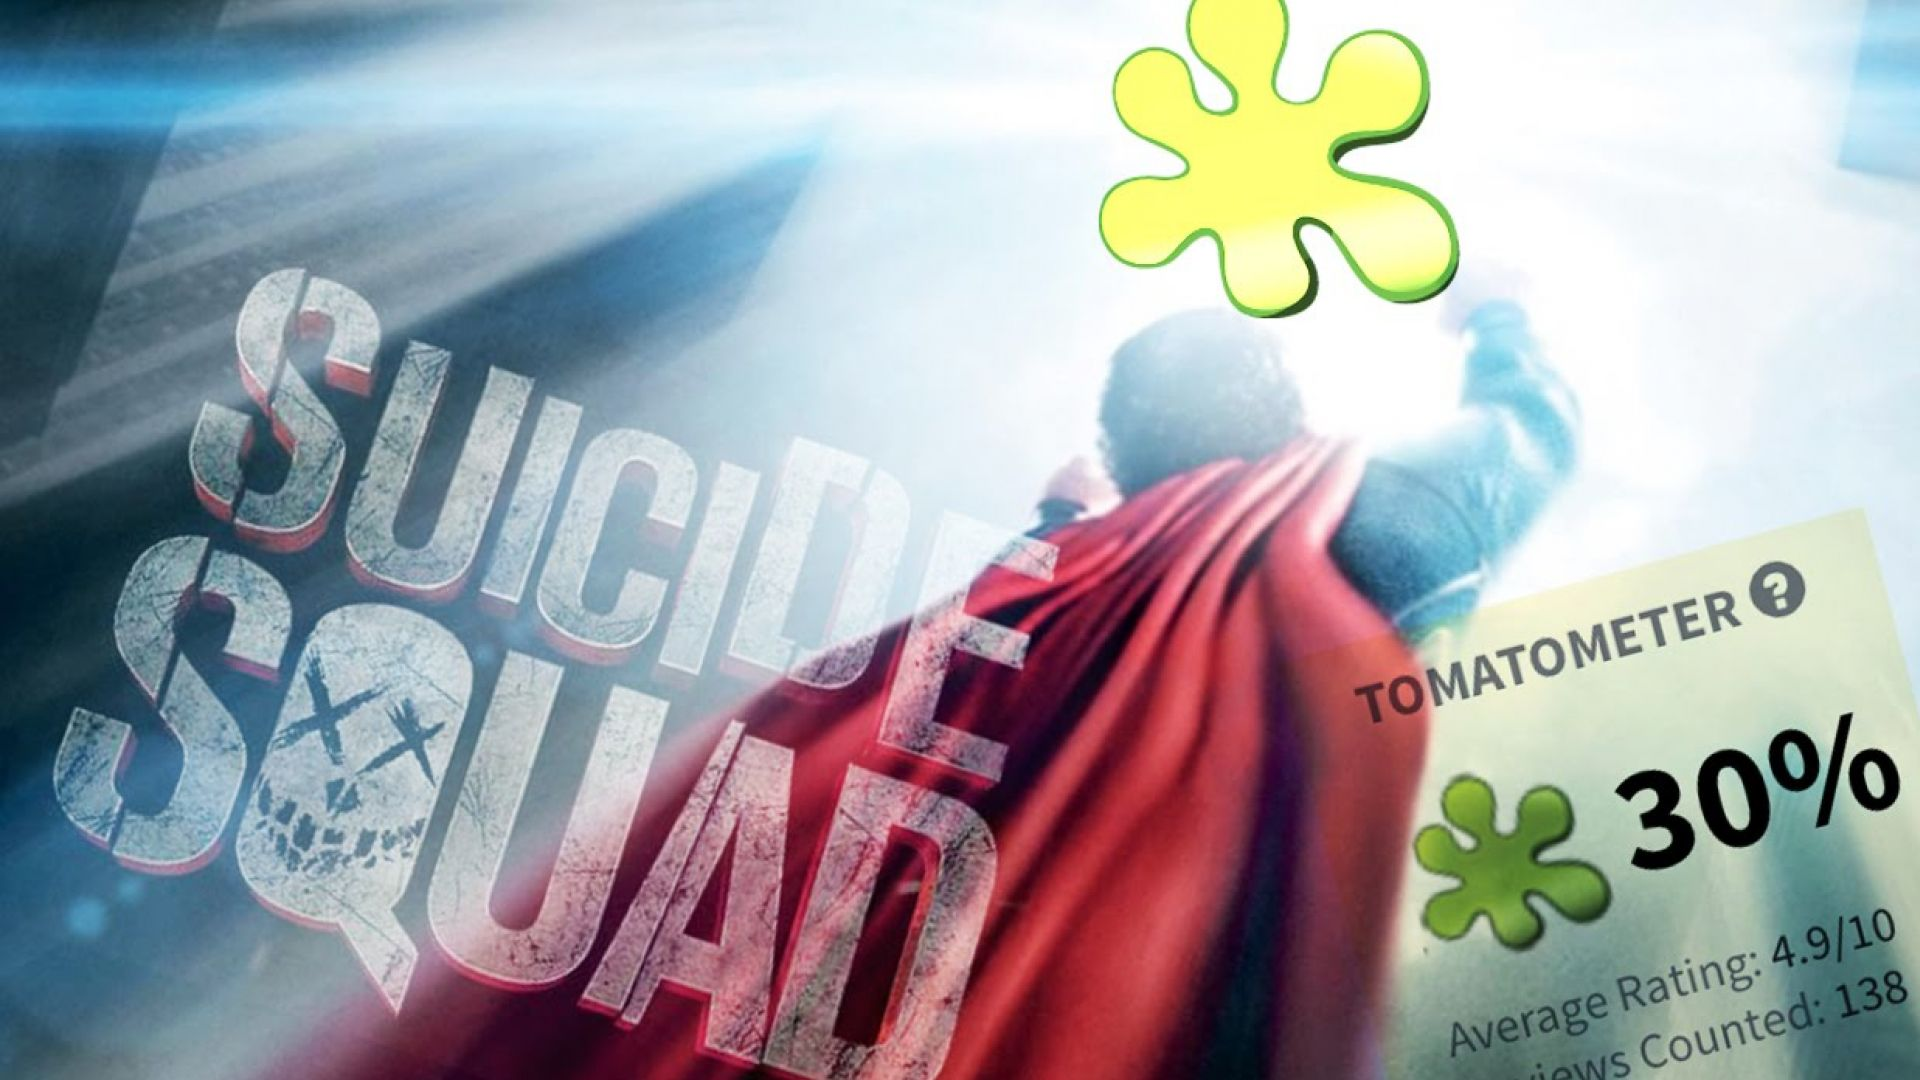 Man of Steel Fights Suicide Squad Critics